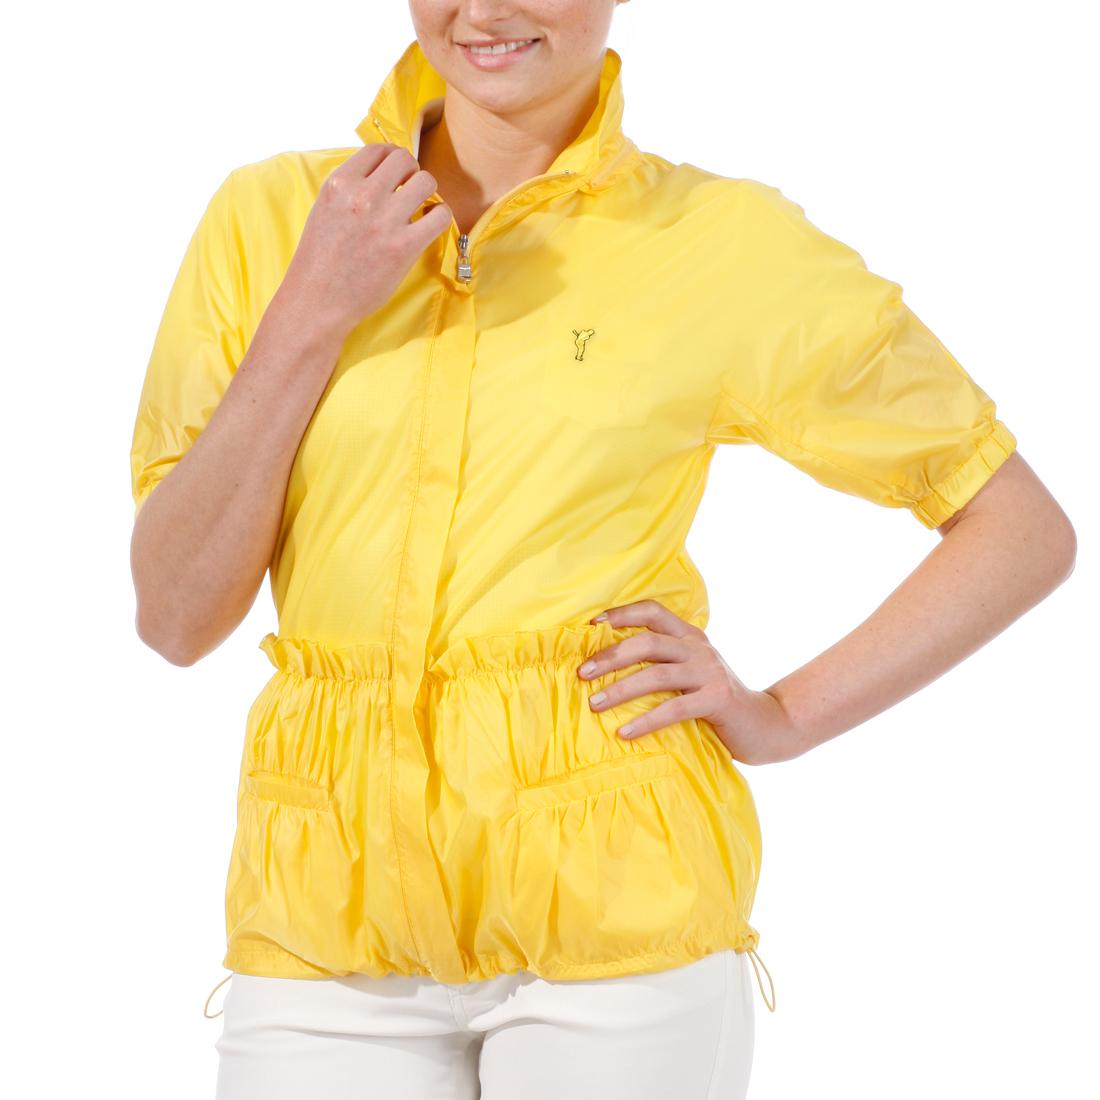 Damen-Kurzarmjacke aus sehr leichtem Material